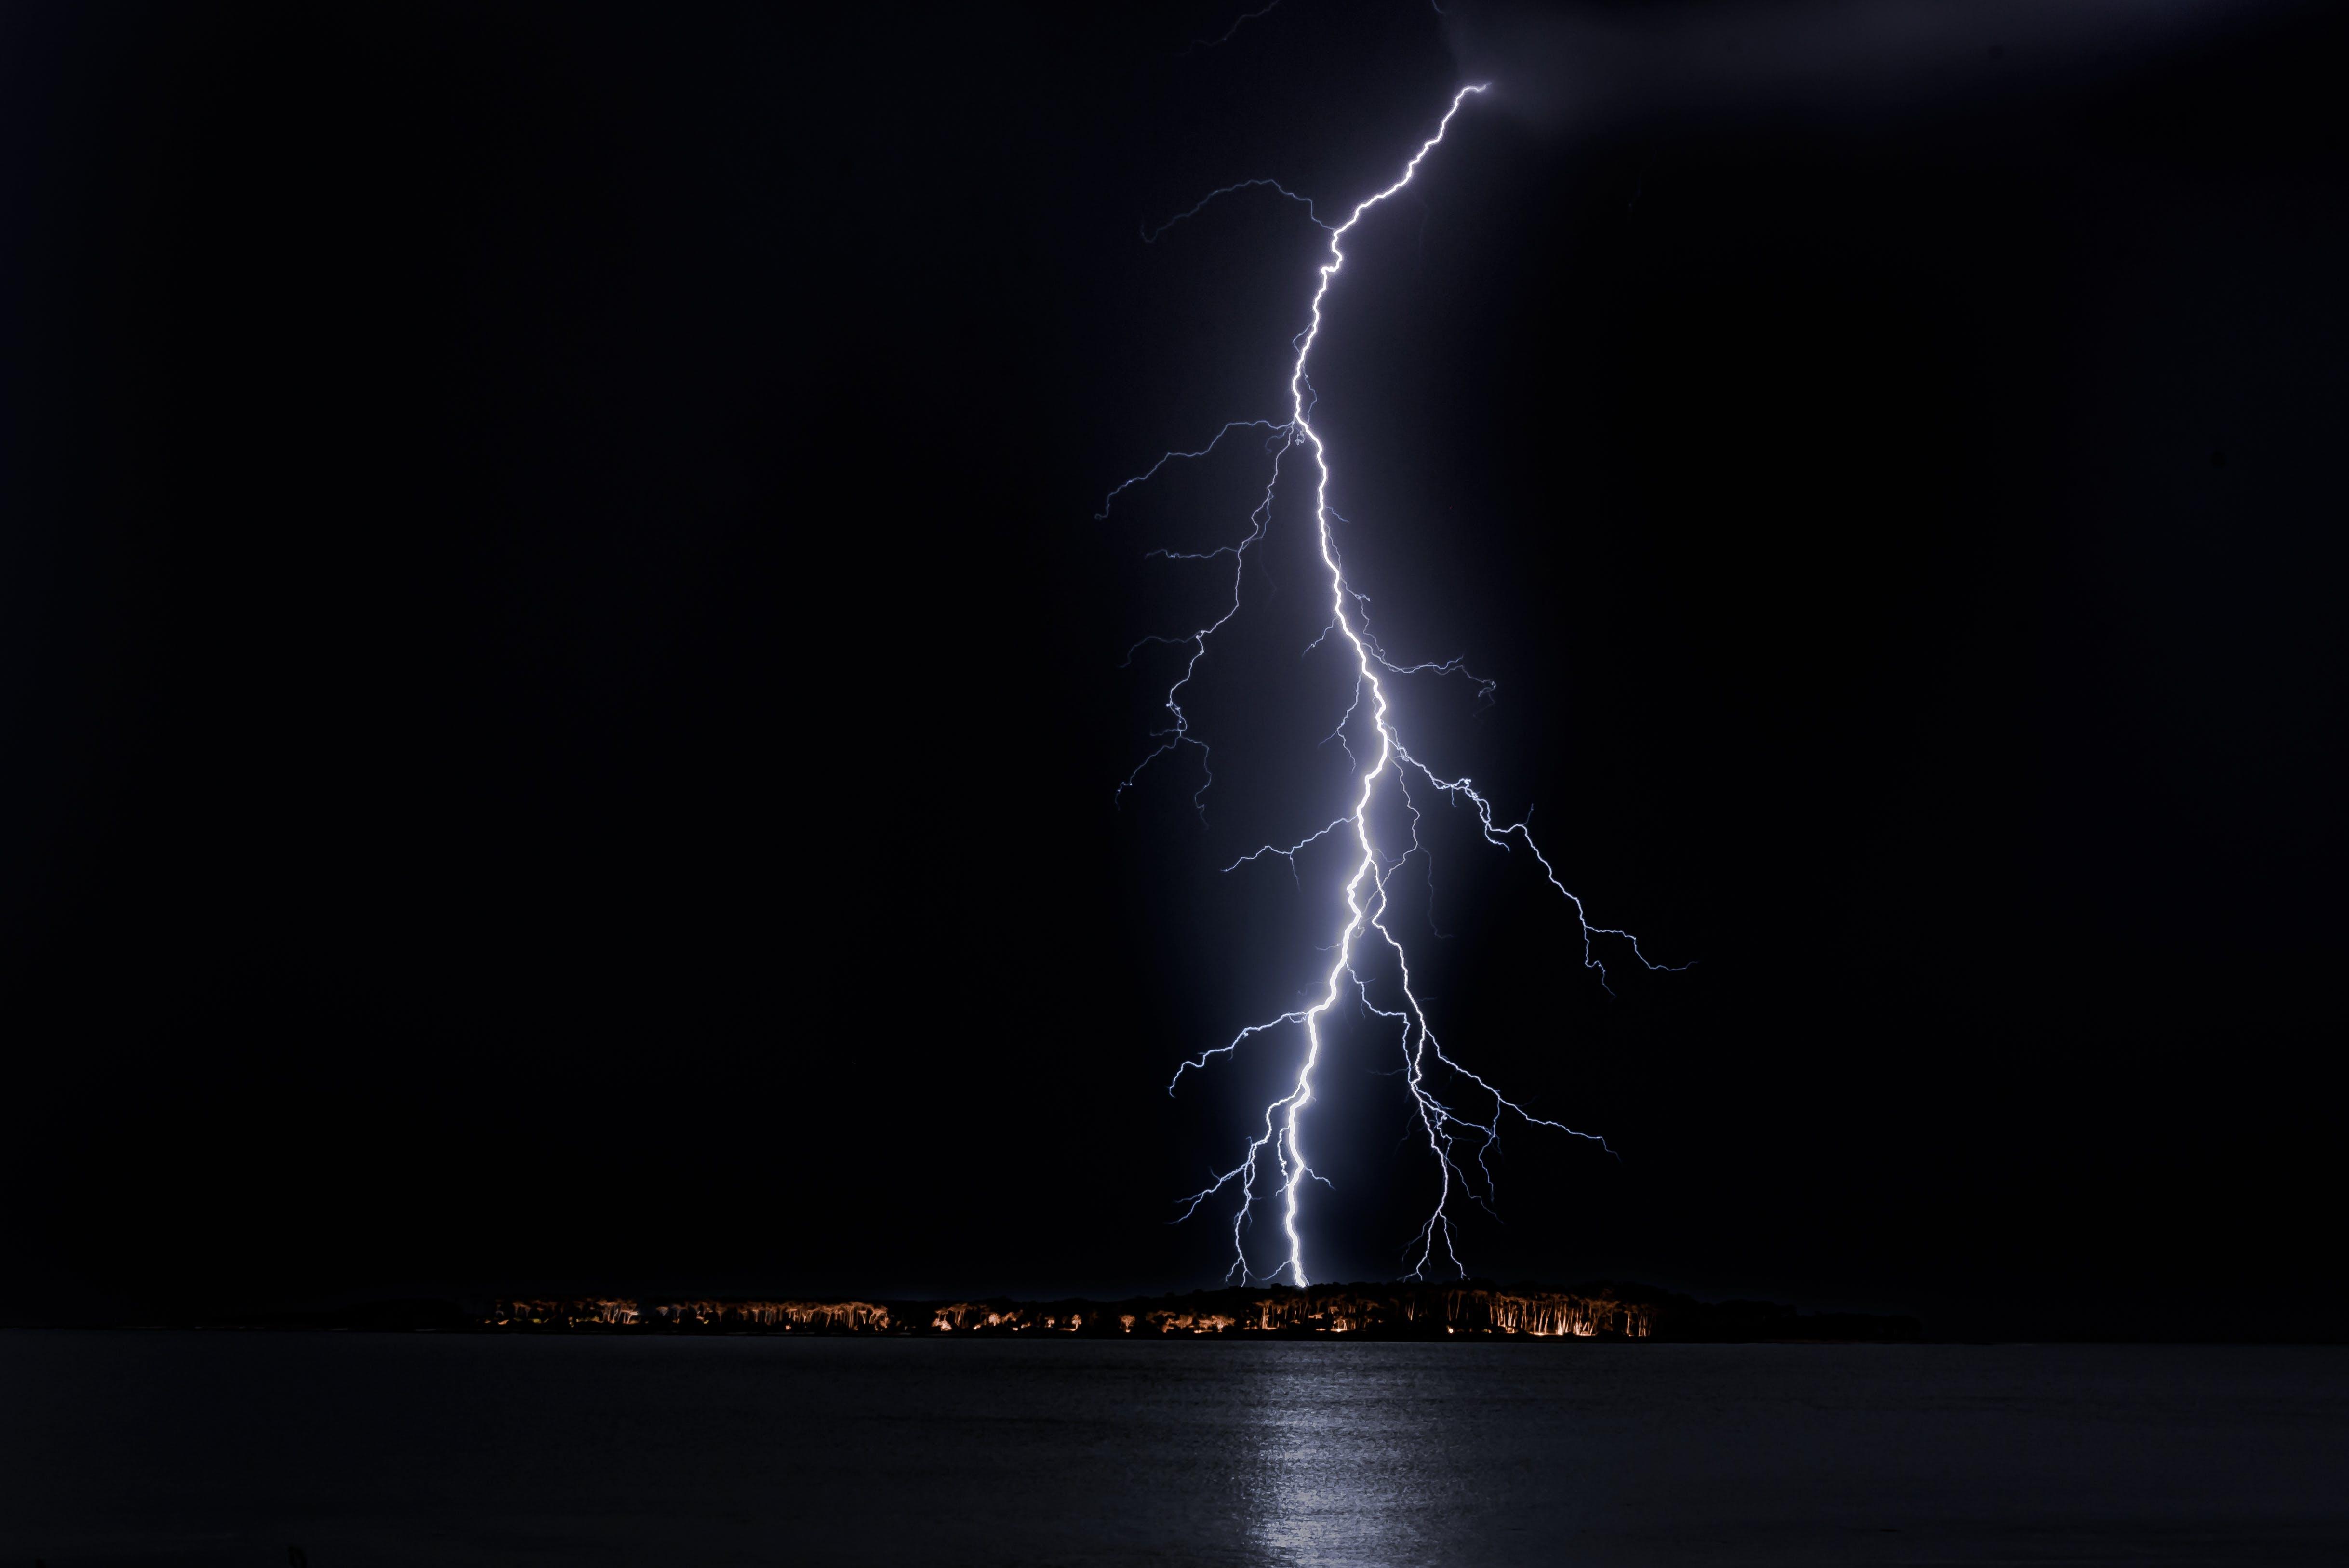 Lightning Strike on City